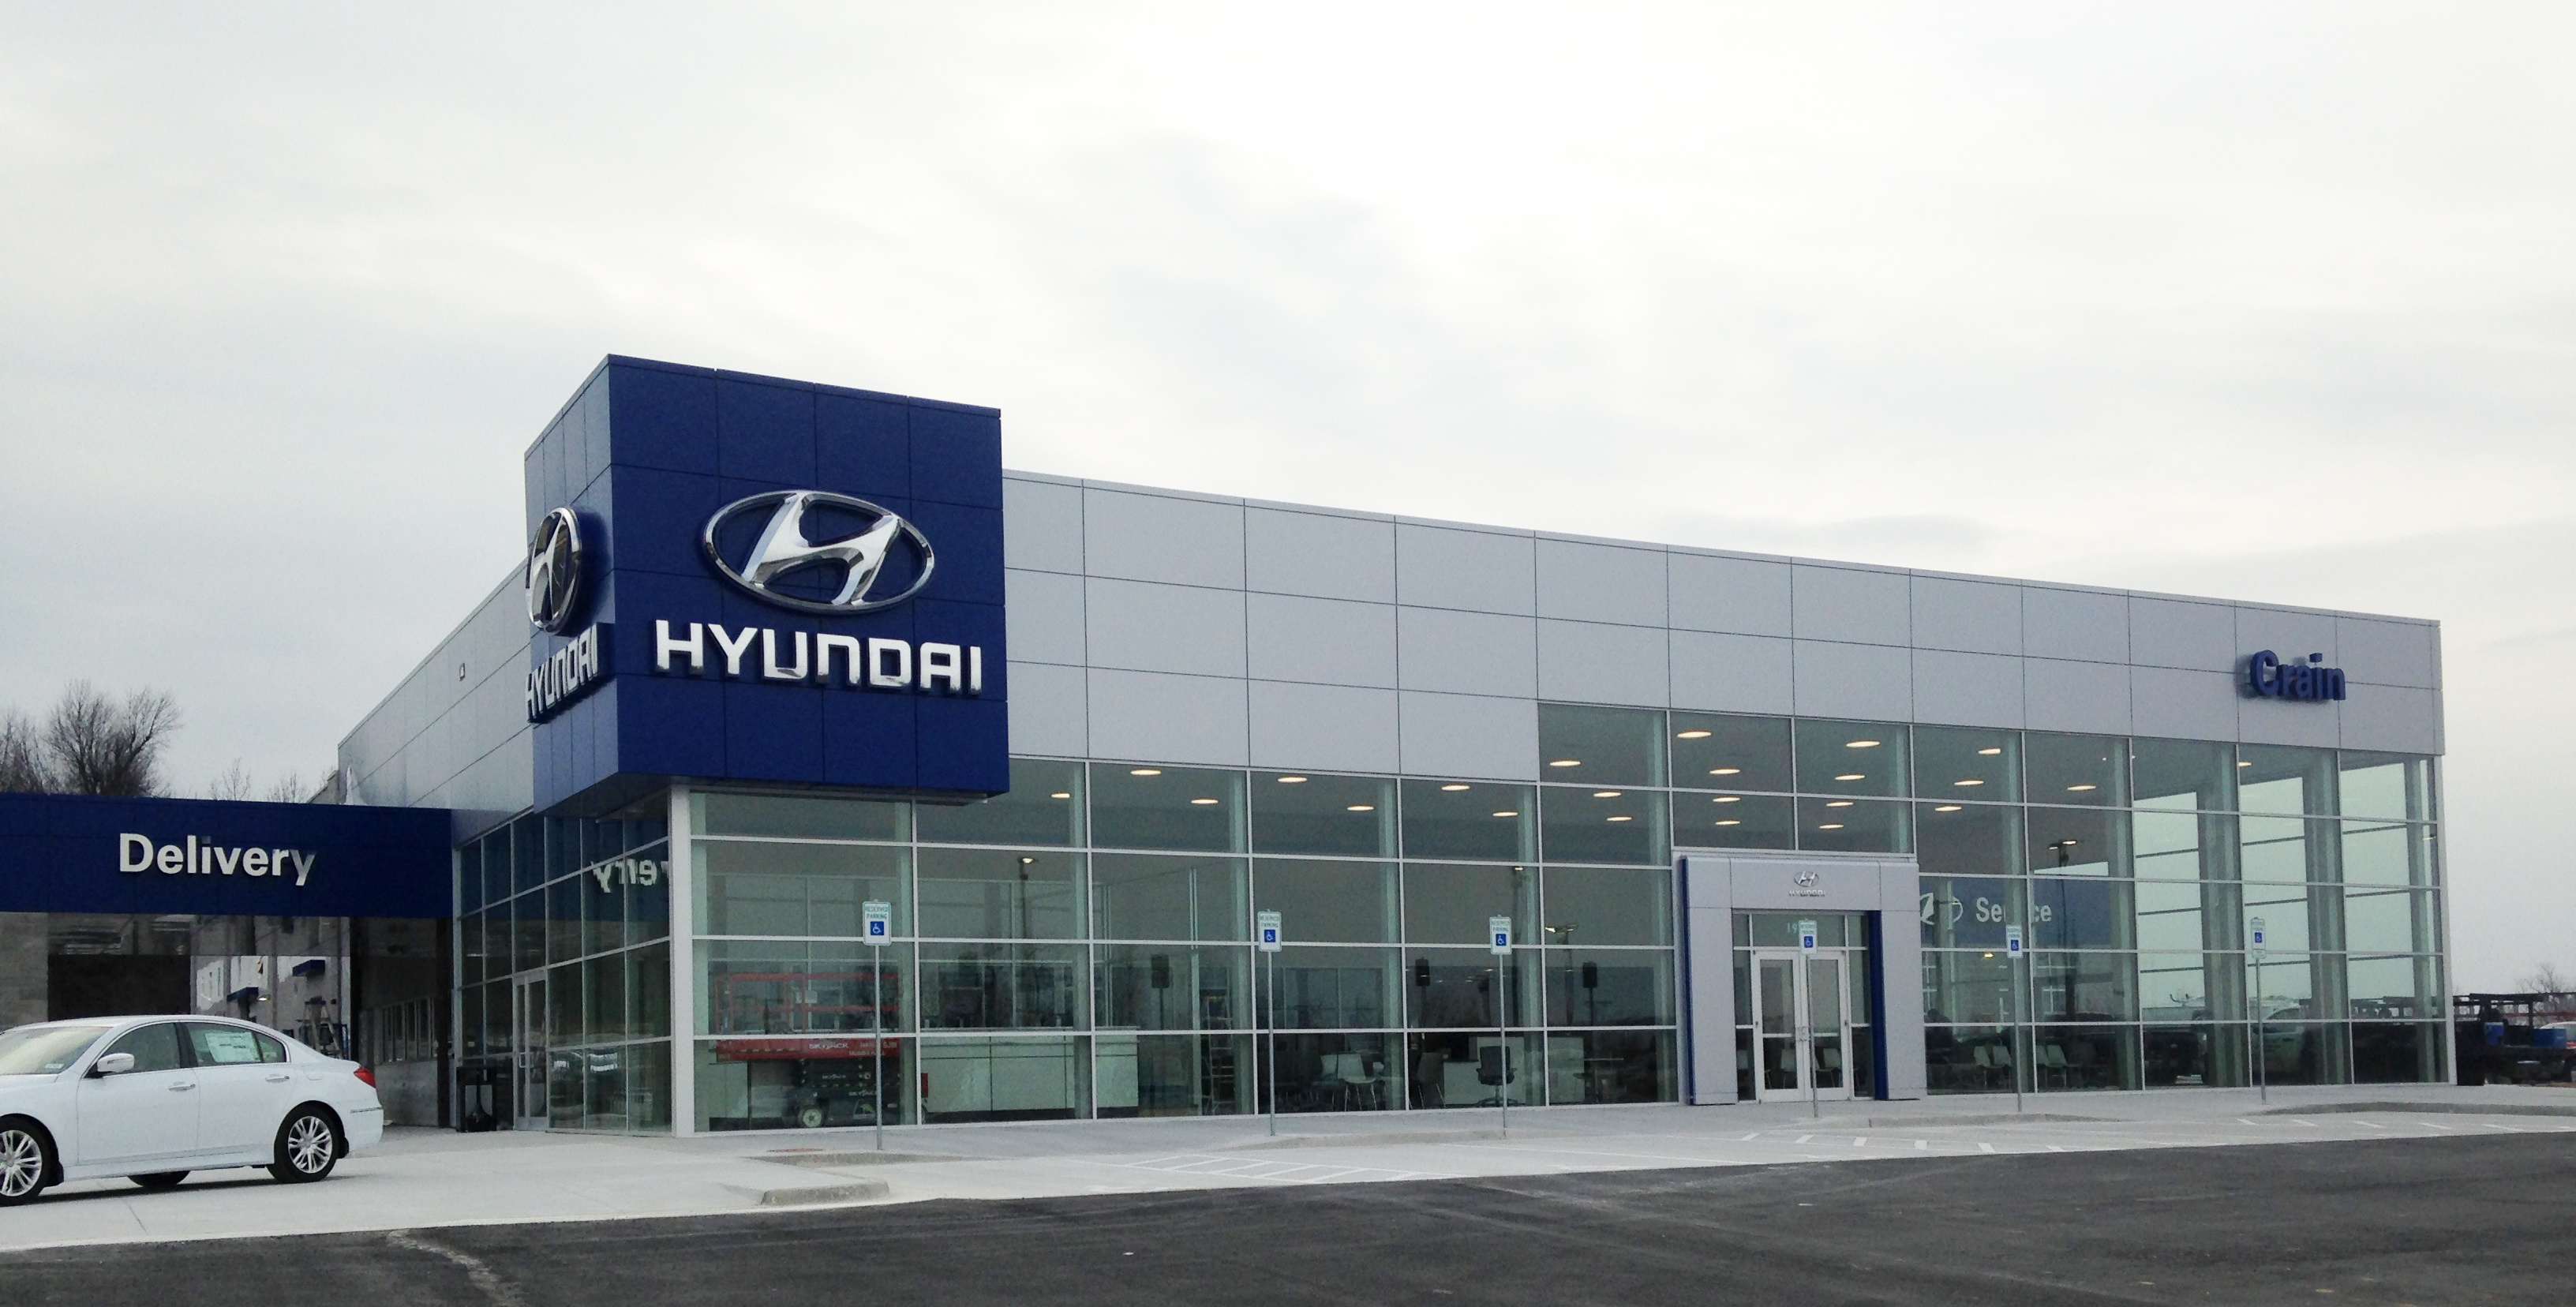 fl review car hyundai milwaukee dealership me metro dealers near boucher tucson brooksville sales wi